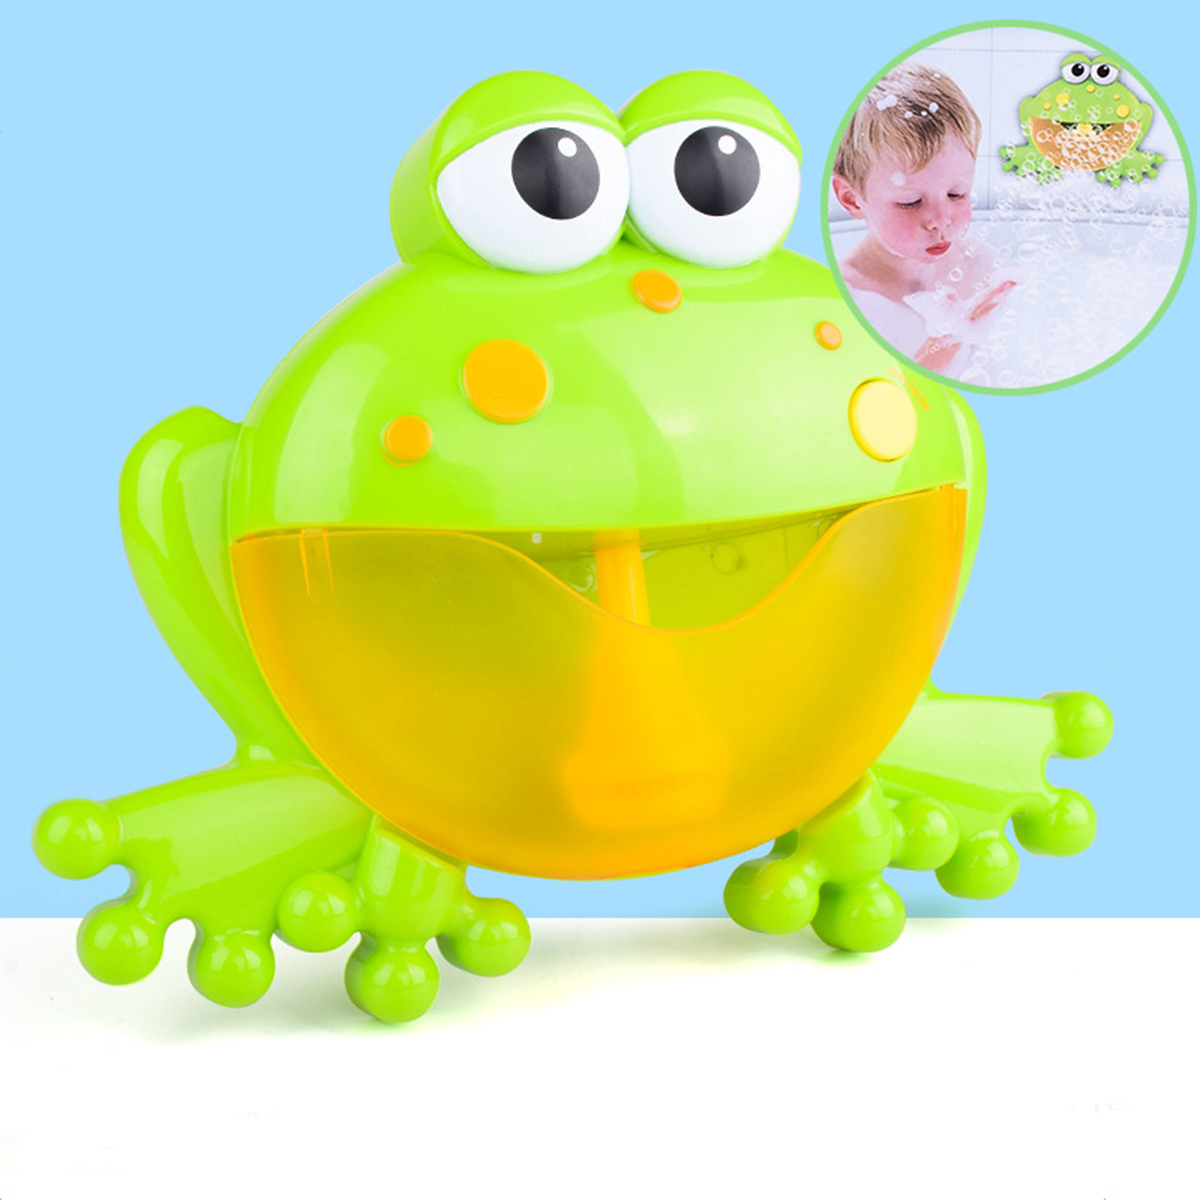 Big Frog Automatic Bubble Blower Music Bubble Maker Baby Bath Toy Bathtub Soap Bubble Machine